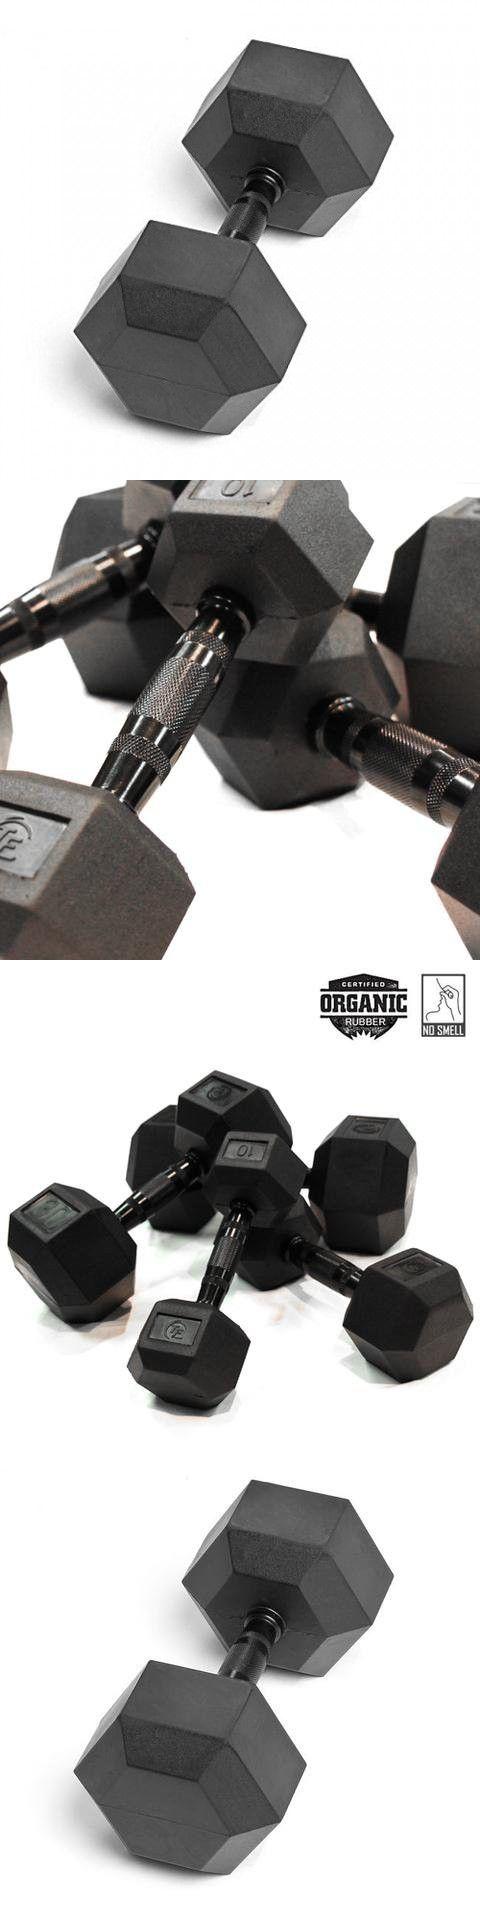 Element Fitness Virgin Rubber Commercial Hex Dumbbells - low odor- 65 lbs